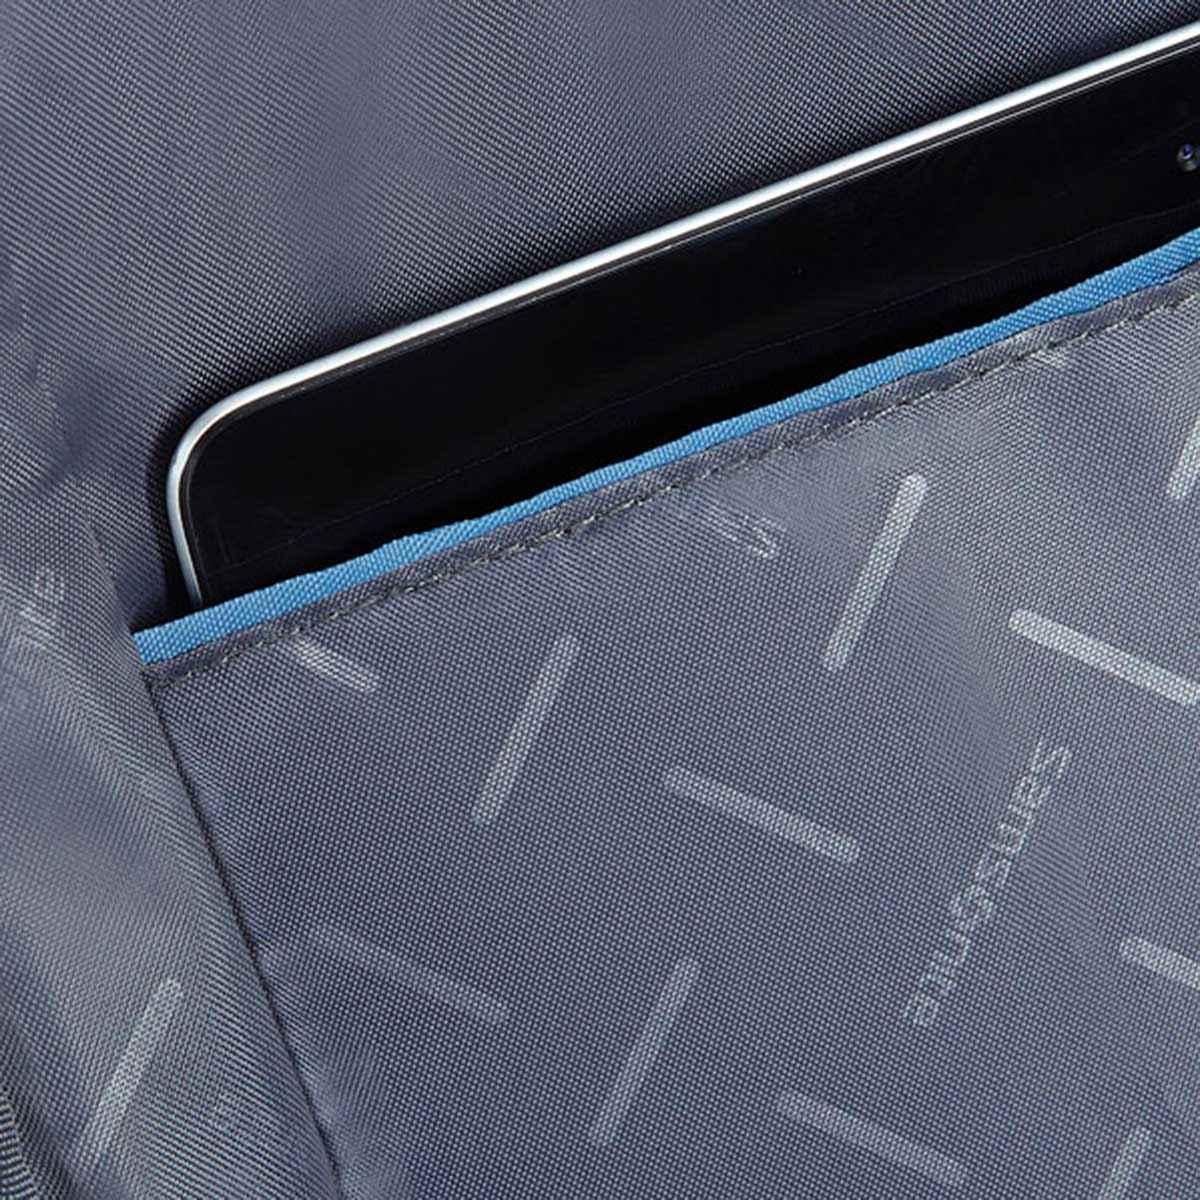 517cf18118 Σακίδιο Πλάτης Samsonite Vectura Laptop Backpack M 15-16″ 59226-4226 Ανθρακί